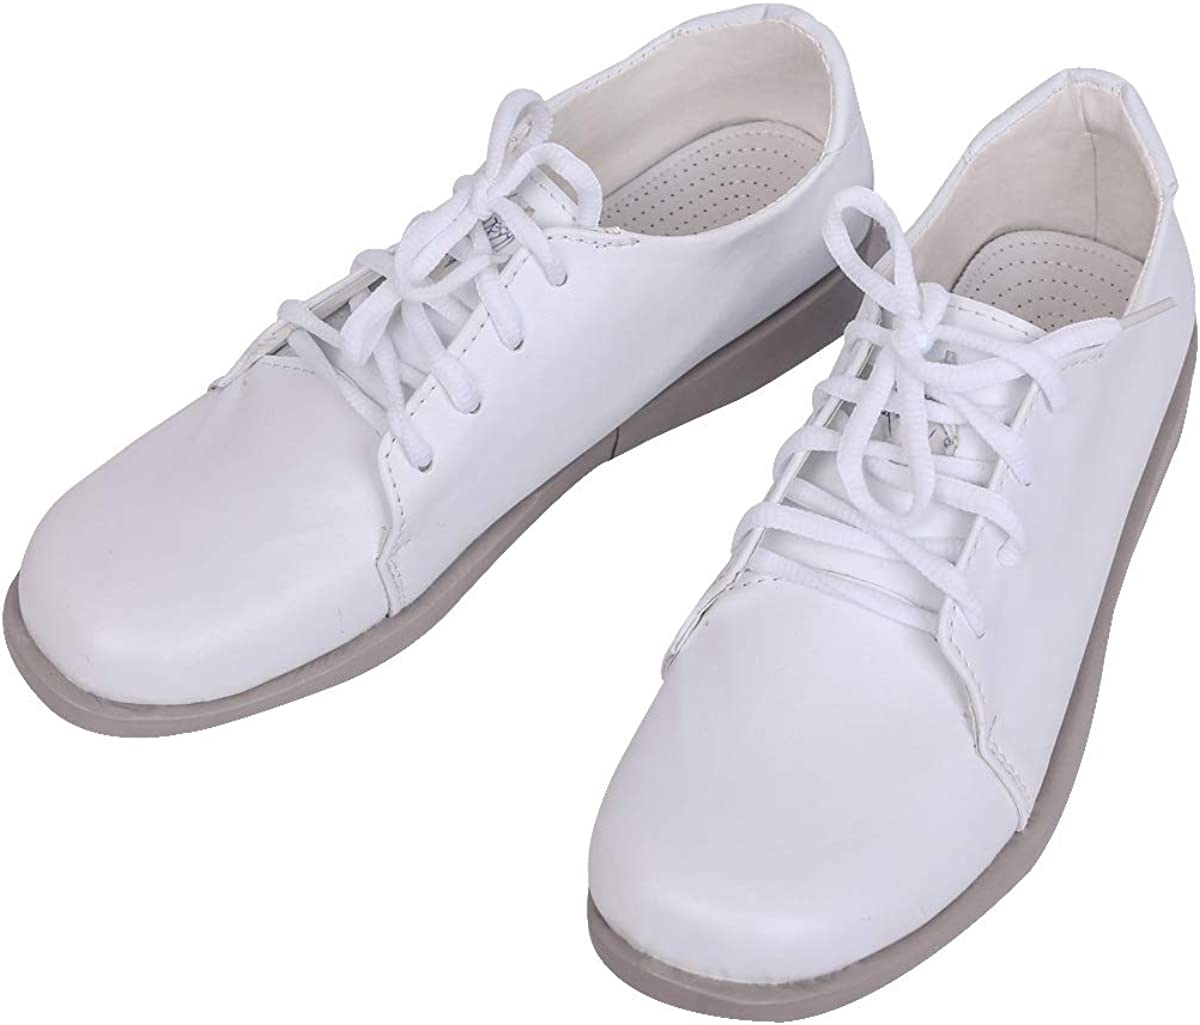 Amazon Com Yuancos Boku No Hero Academia Shie Hassaikai Chisaki Cosplay Shoes S008 Clothing Shie hassaikai (死 (し) 穢 (え) 八 (はっ) 斎 (さい) 會 (かい) shie hassaikai?, literally meaning the eight precepts of death) was a yakuza organization led by overhaul. yuancos boku no hero academia shie